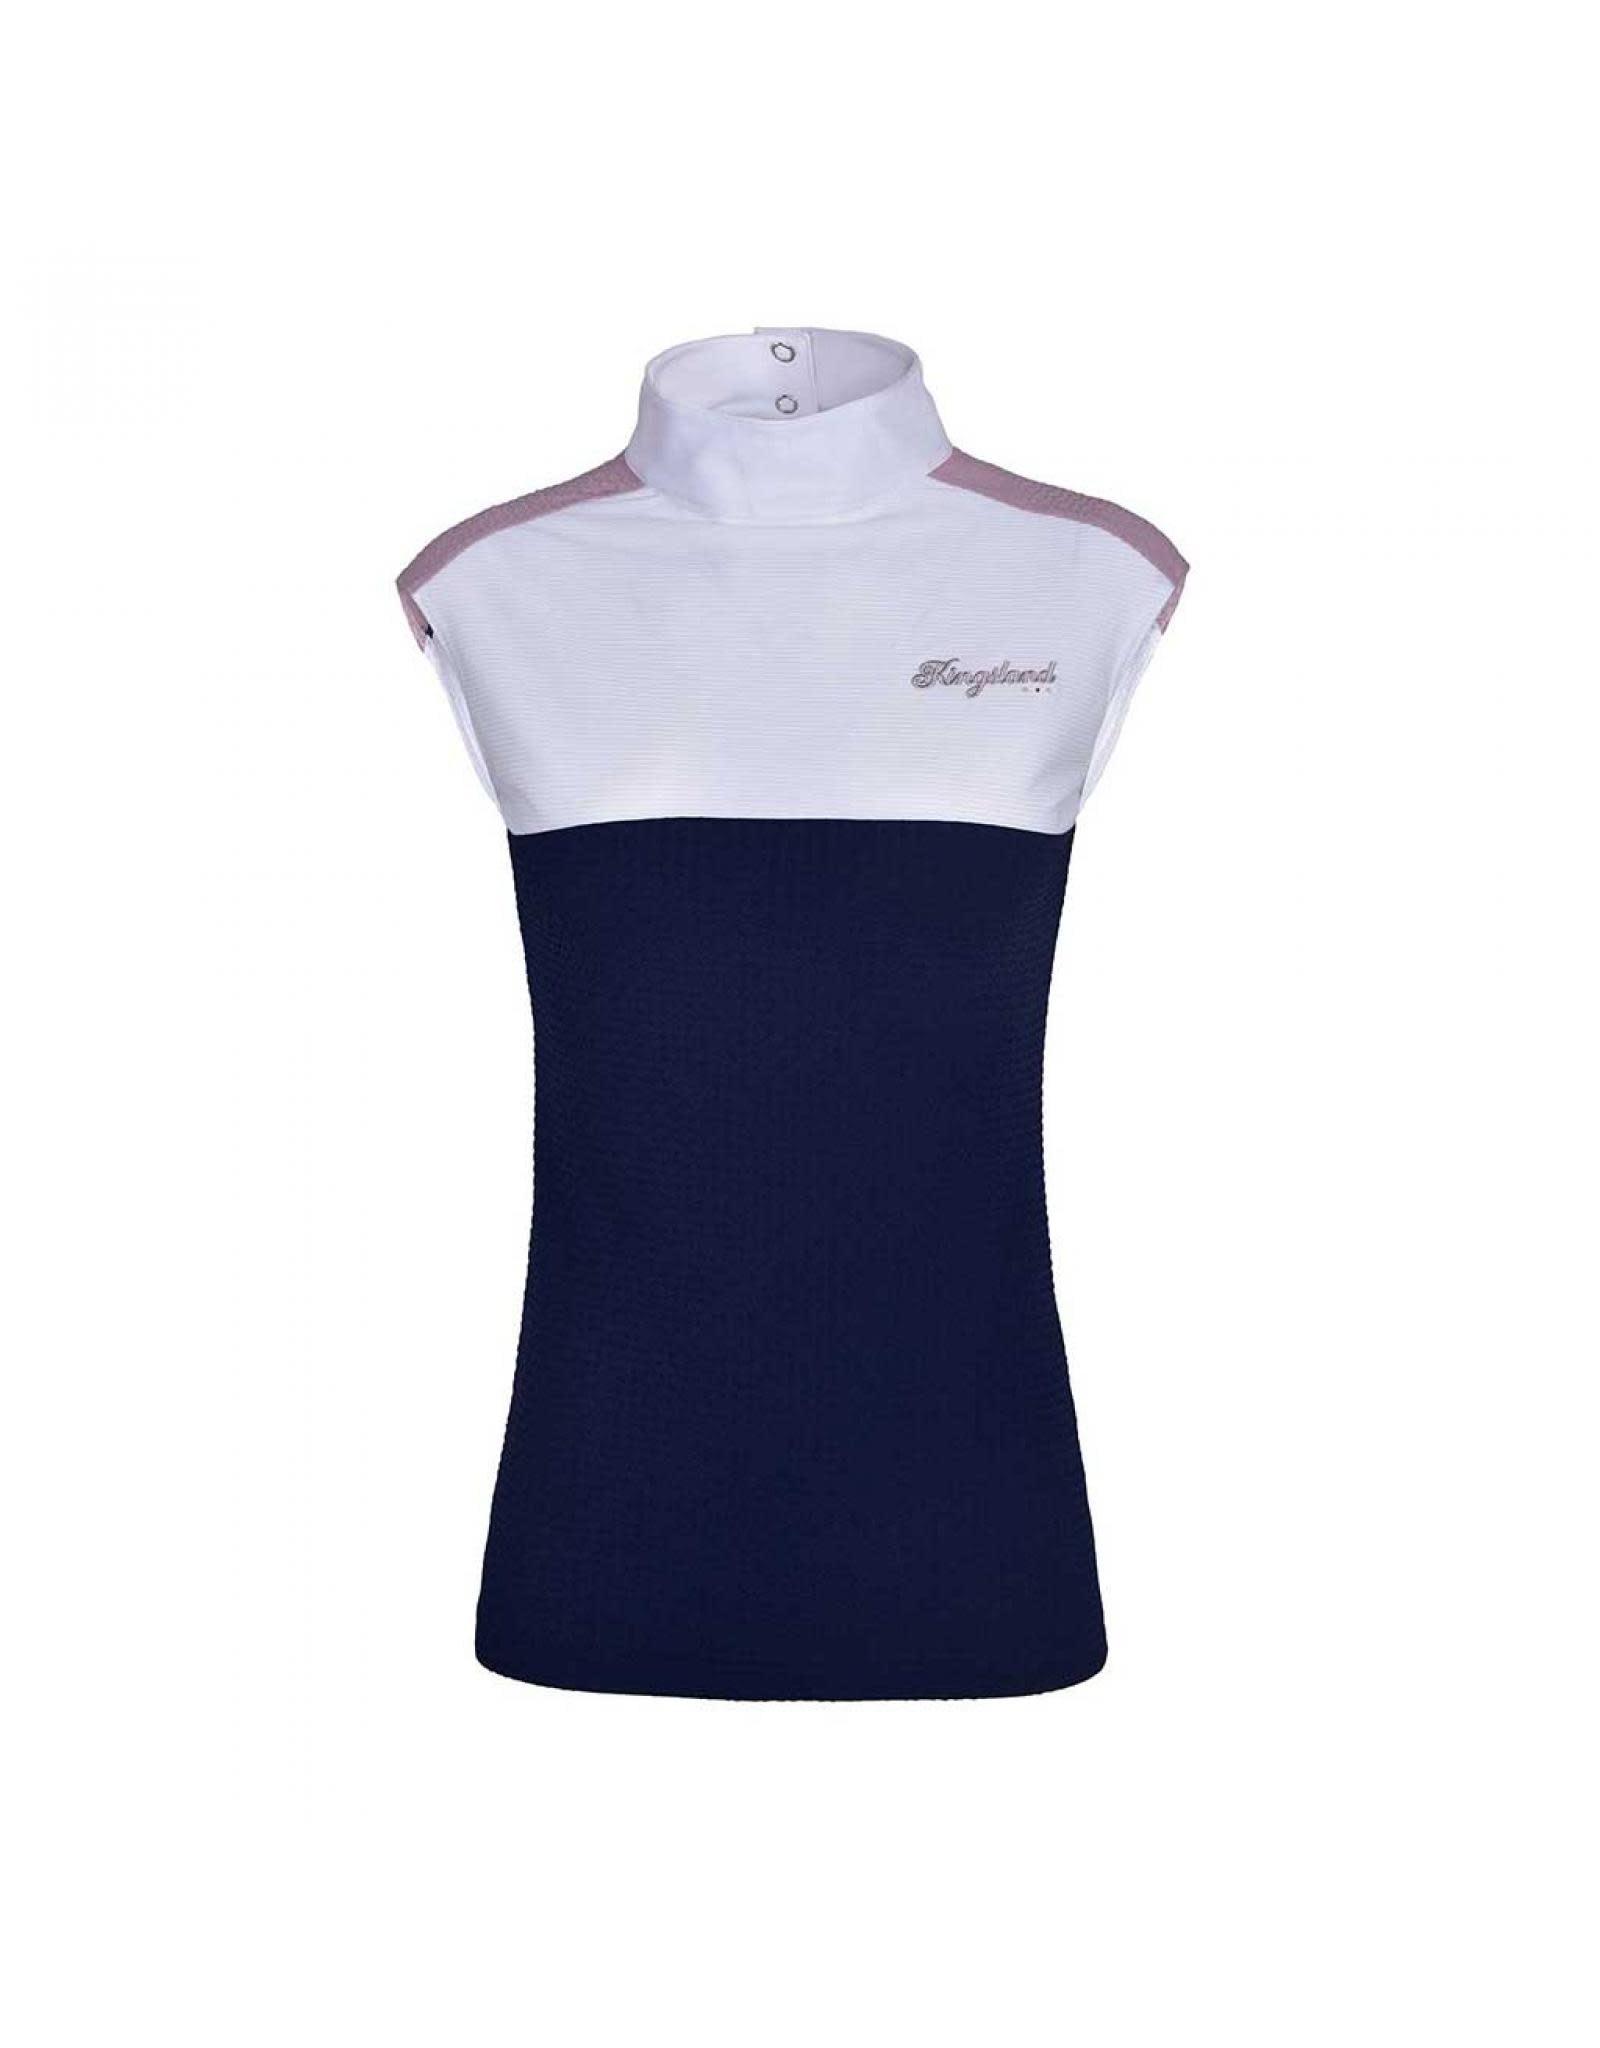 Kingsland KL Lia Show Shirt Navy